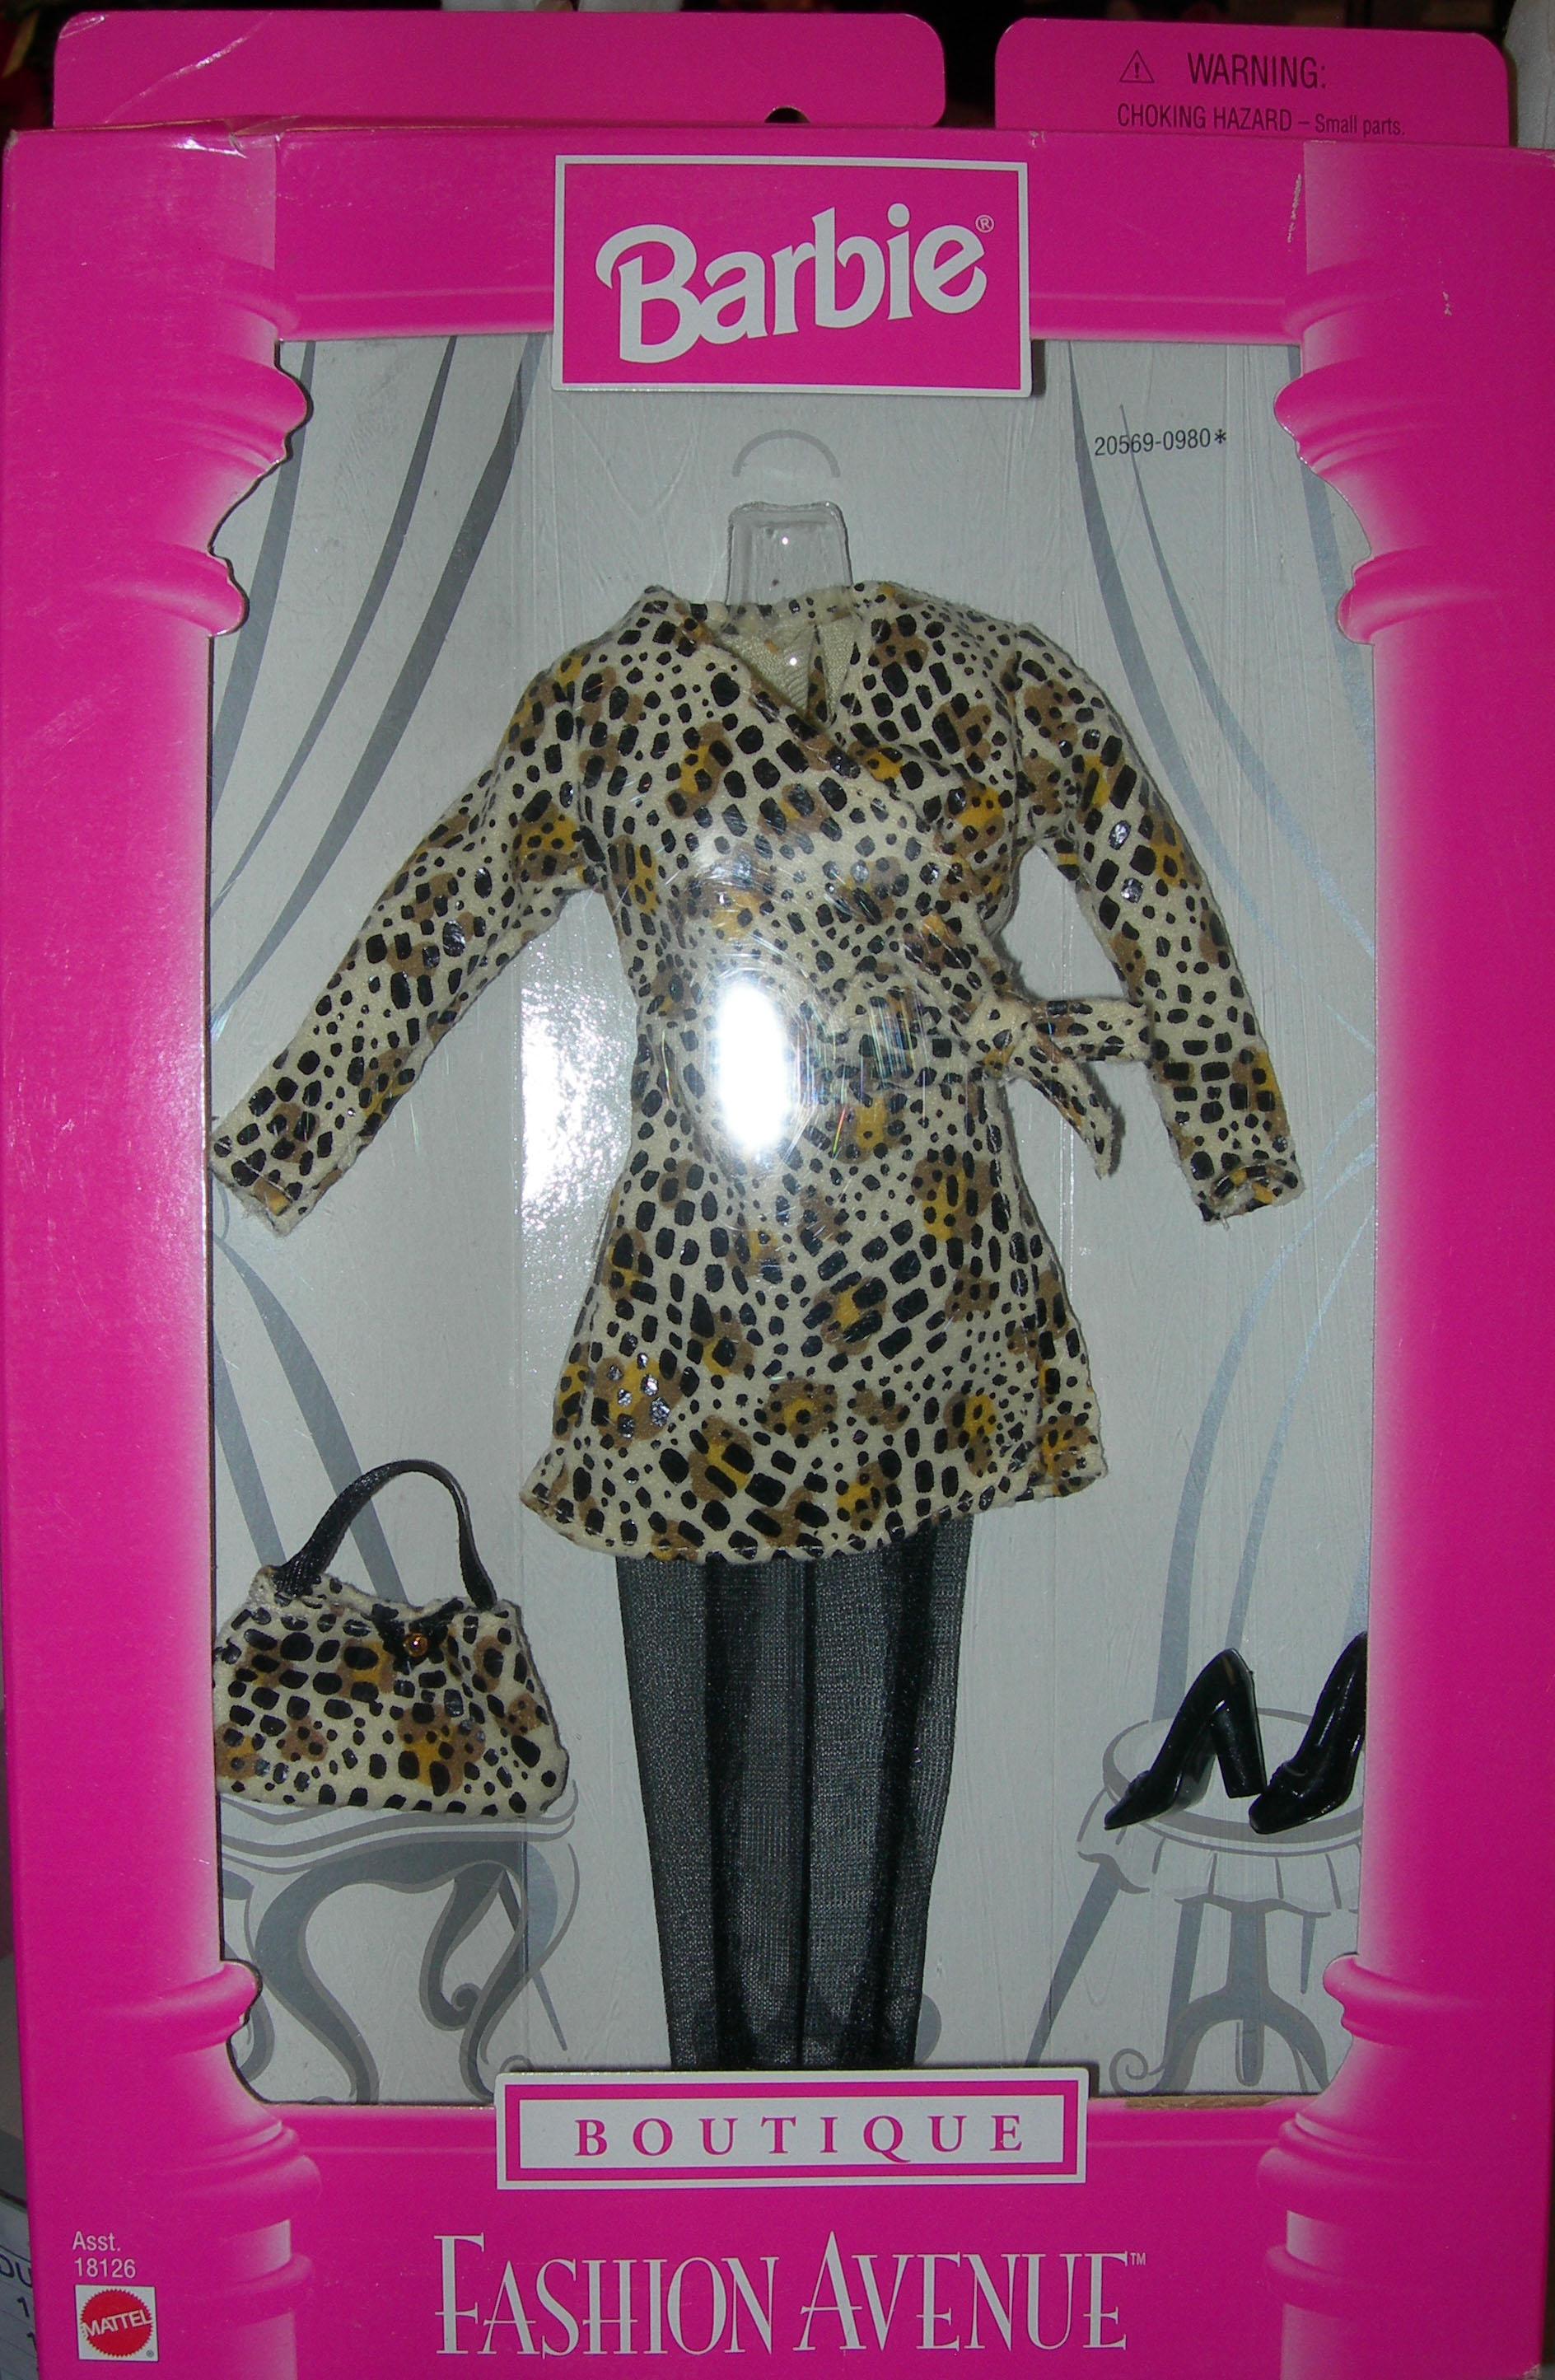 Barbie fashion avenue collection 93